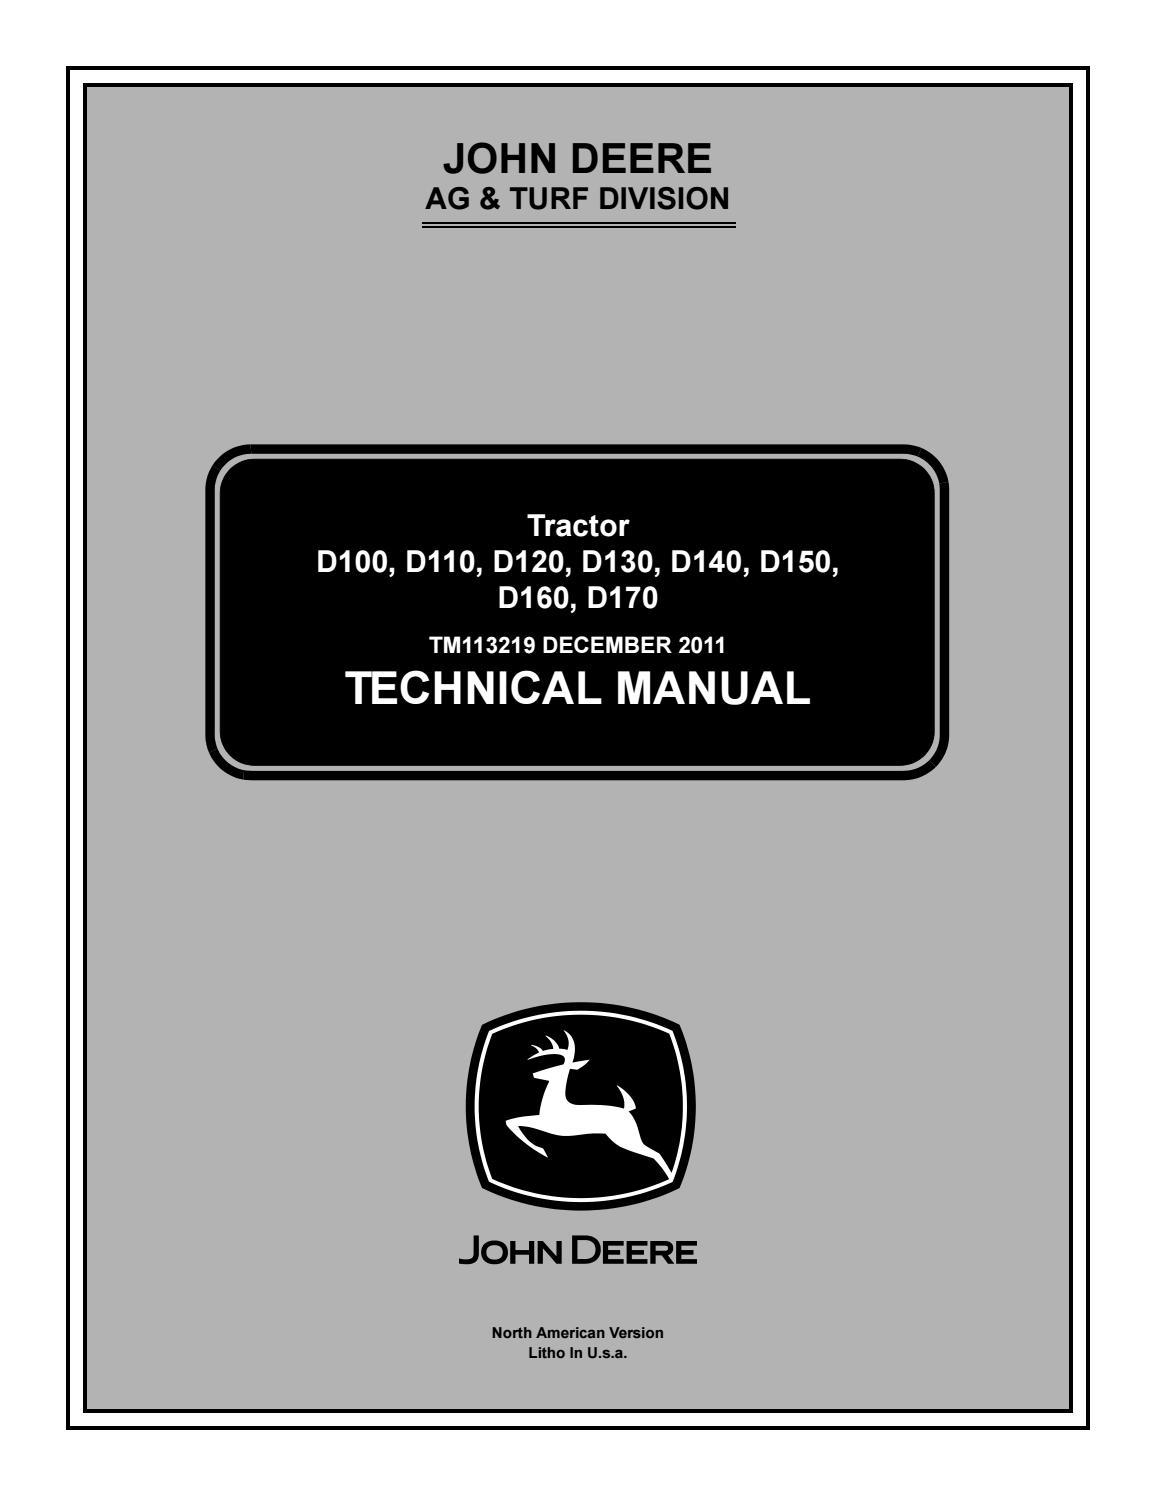 John Deere D100 D110 D120 D130 D140 D150 D160 Repair Service ... on john deere parts specifications, john deere solenoid schematics, john deere maintenance schedule, john deere ignition switch wiring, john deere solenoid wiring, john deere radio wiring diagram, john deere parts diagrams, john deere diagnostic codes,